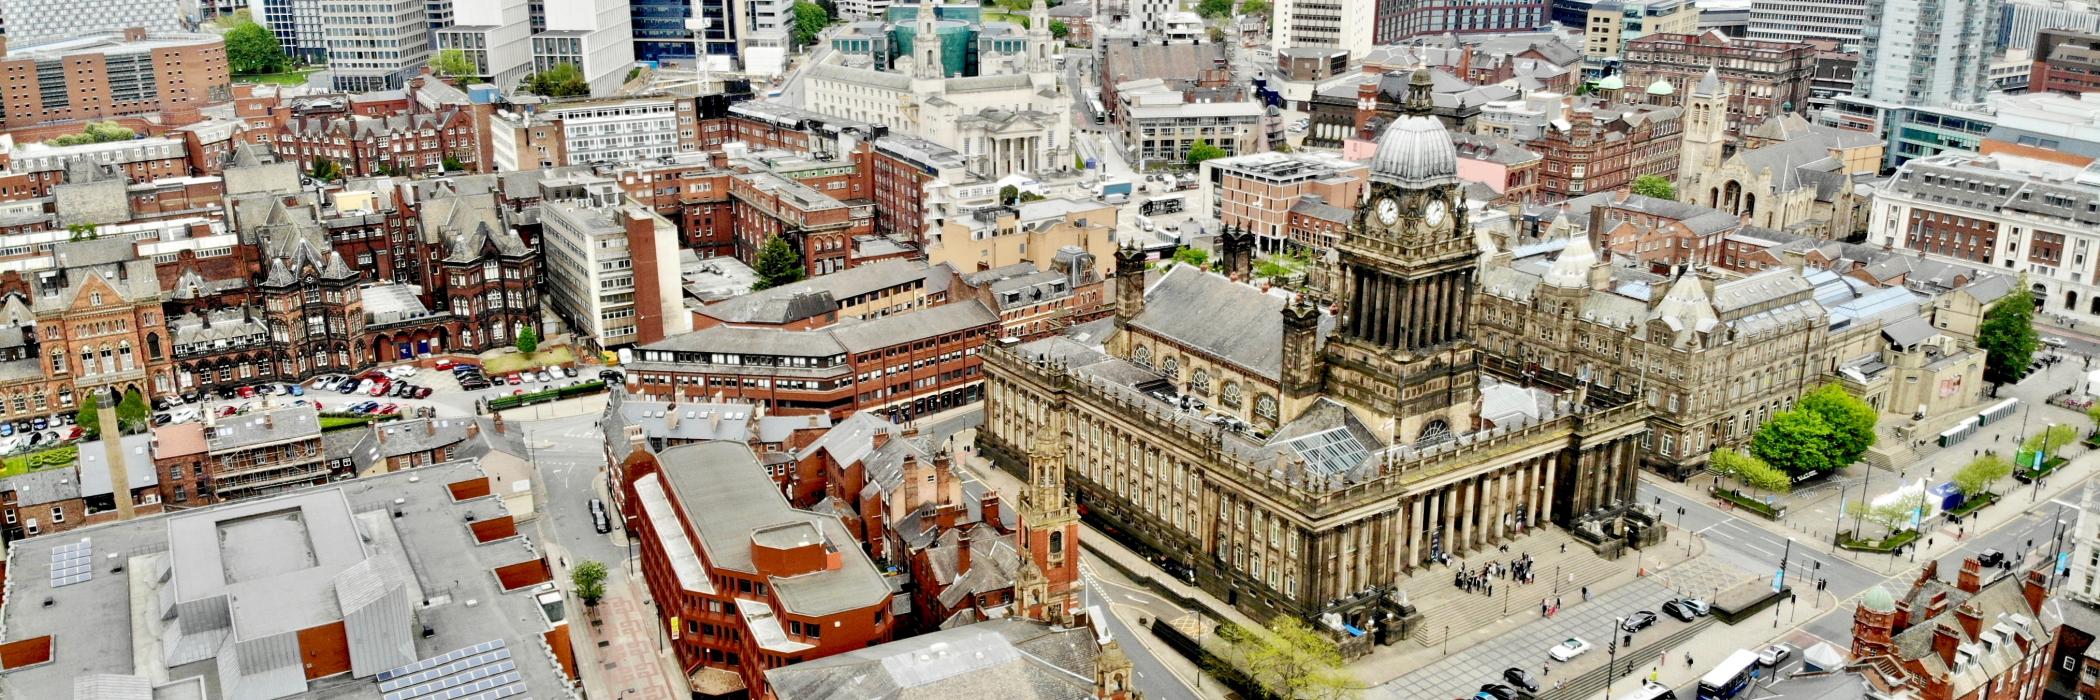 Aerial view of Leeds